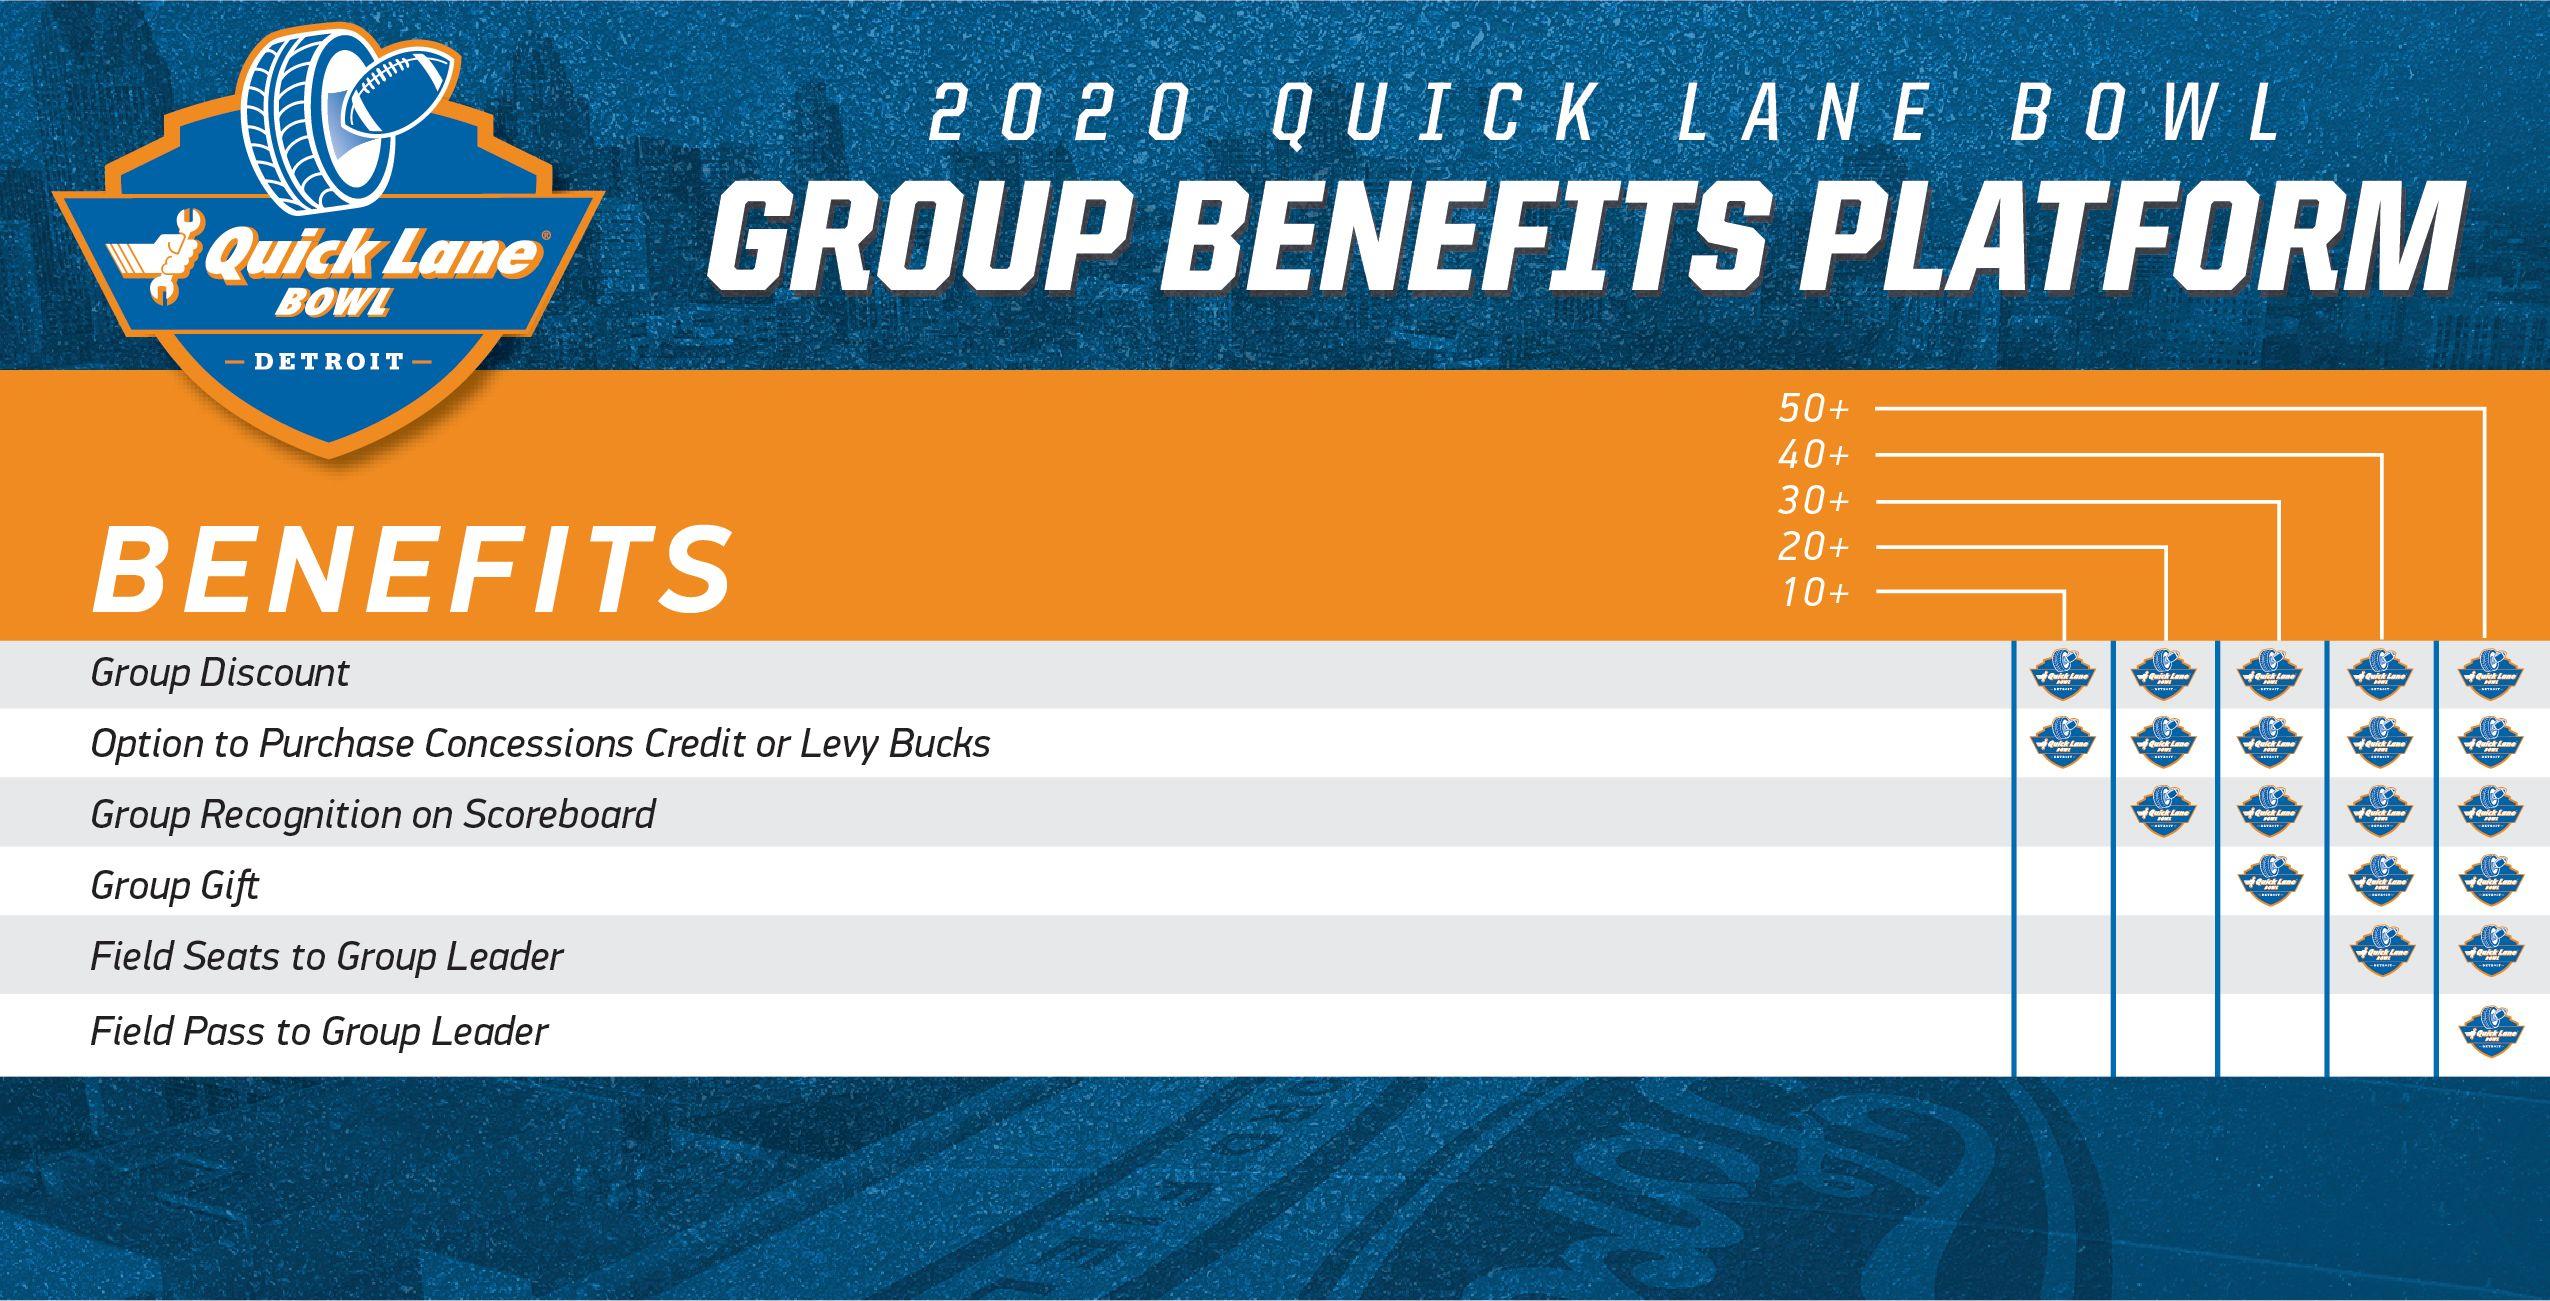 2020_QLB_GROUP_BENEFITS_PLATFORM